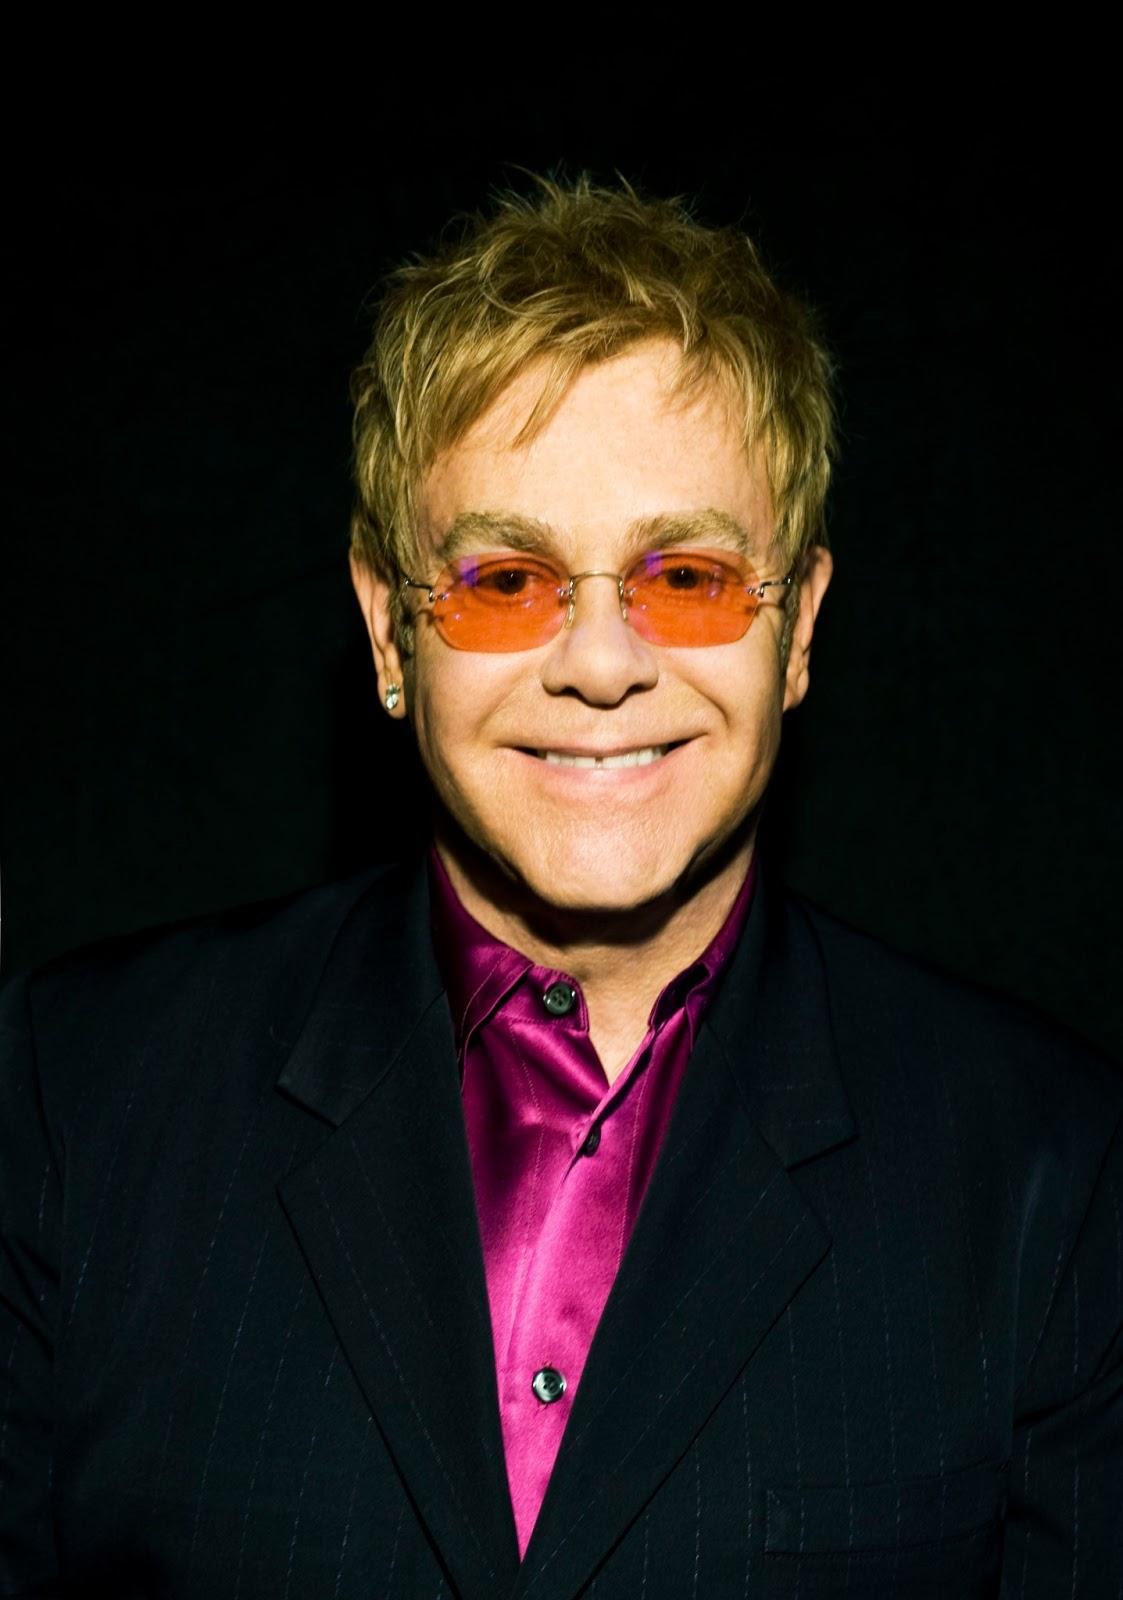 Elton John Hairstyle Men Hairstyles Men Hair Styles